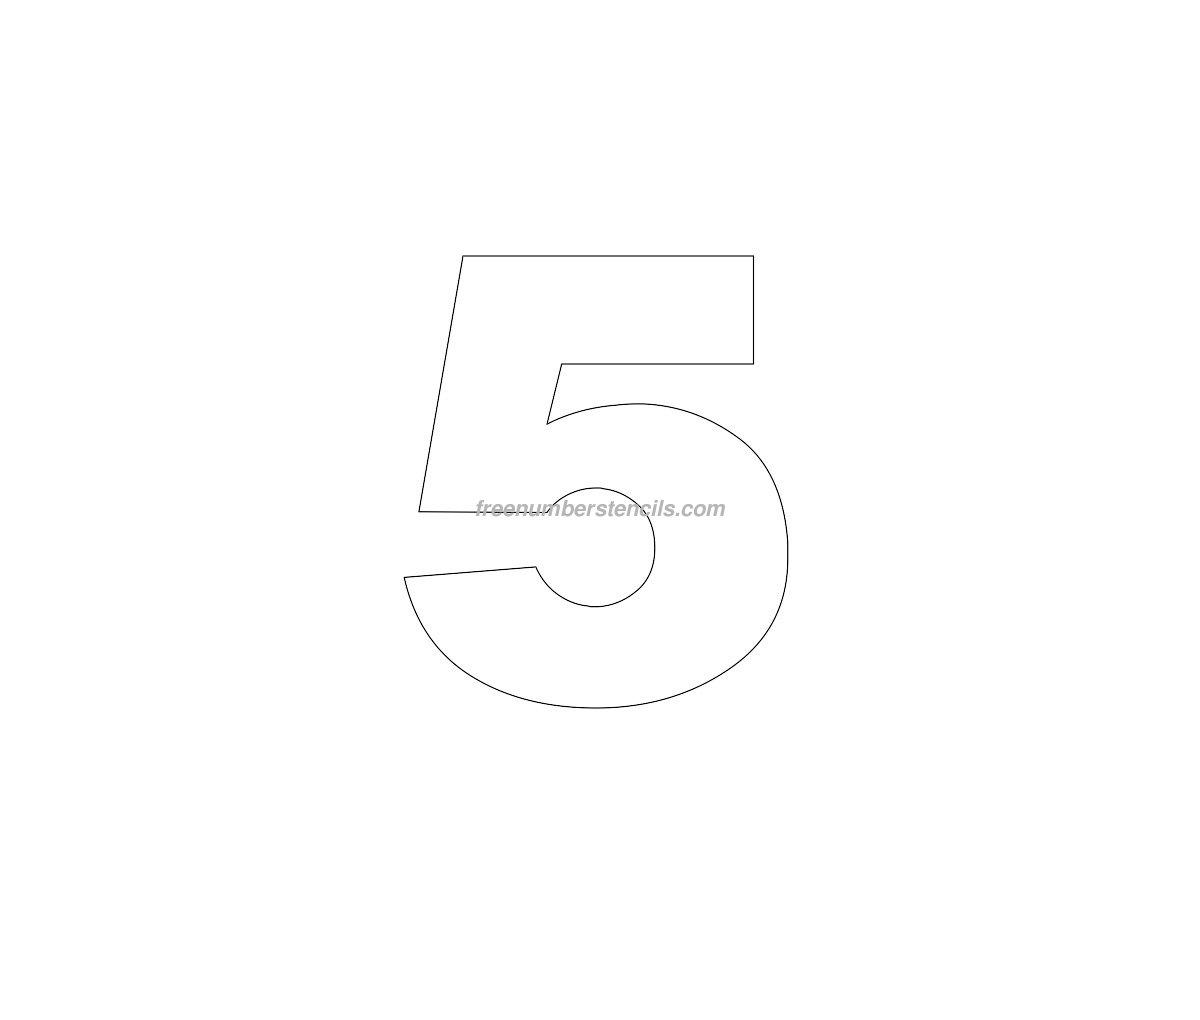 Free helvetica 5 number stencil freenumberstencilscom for Helvetica letter stencils